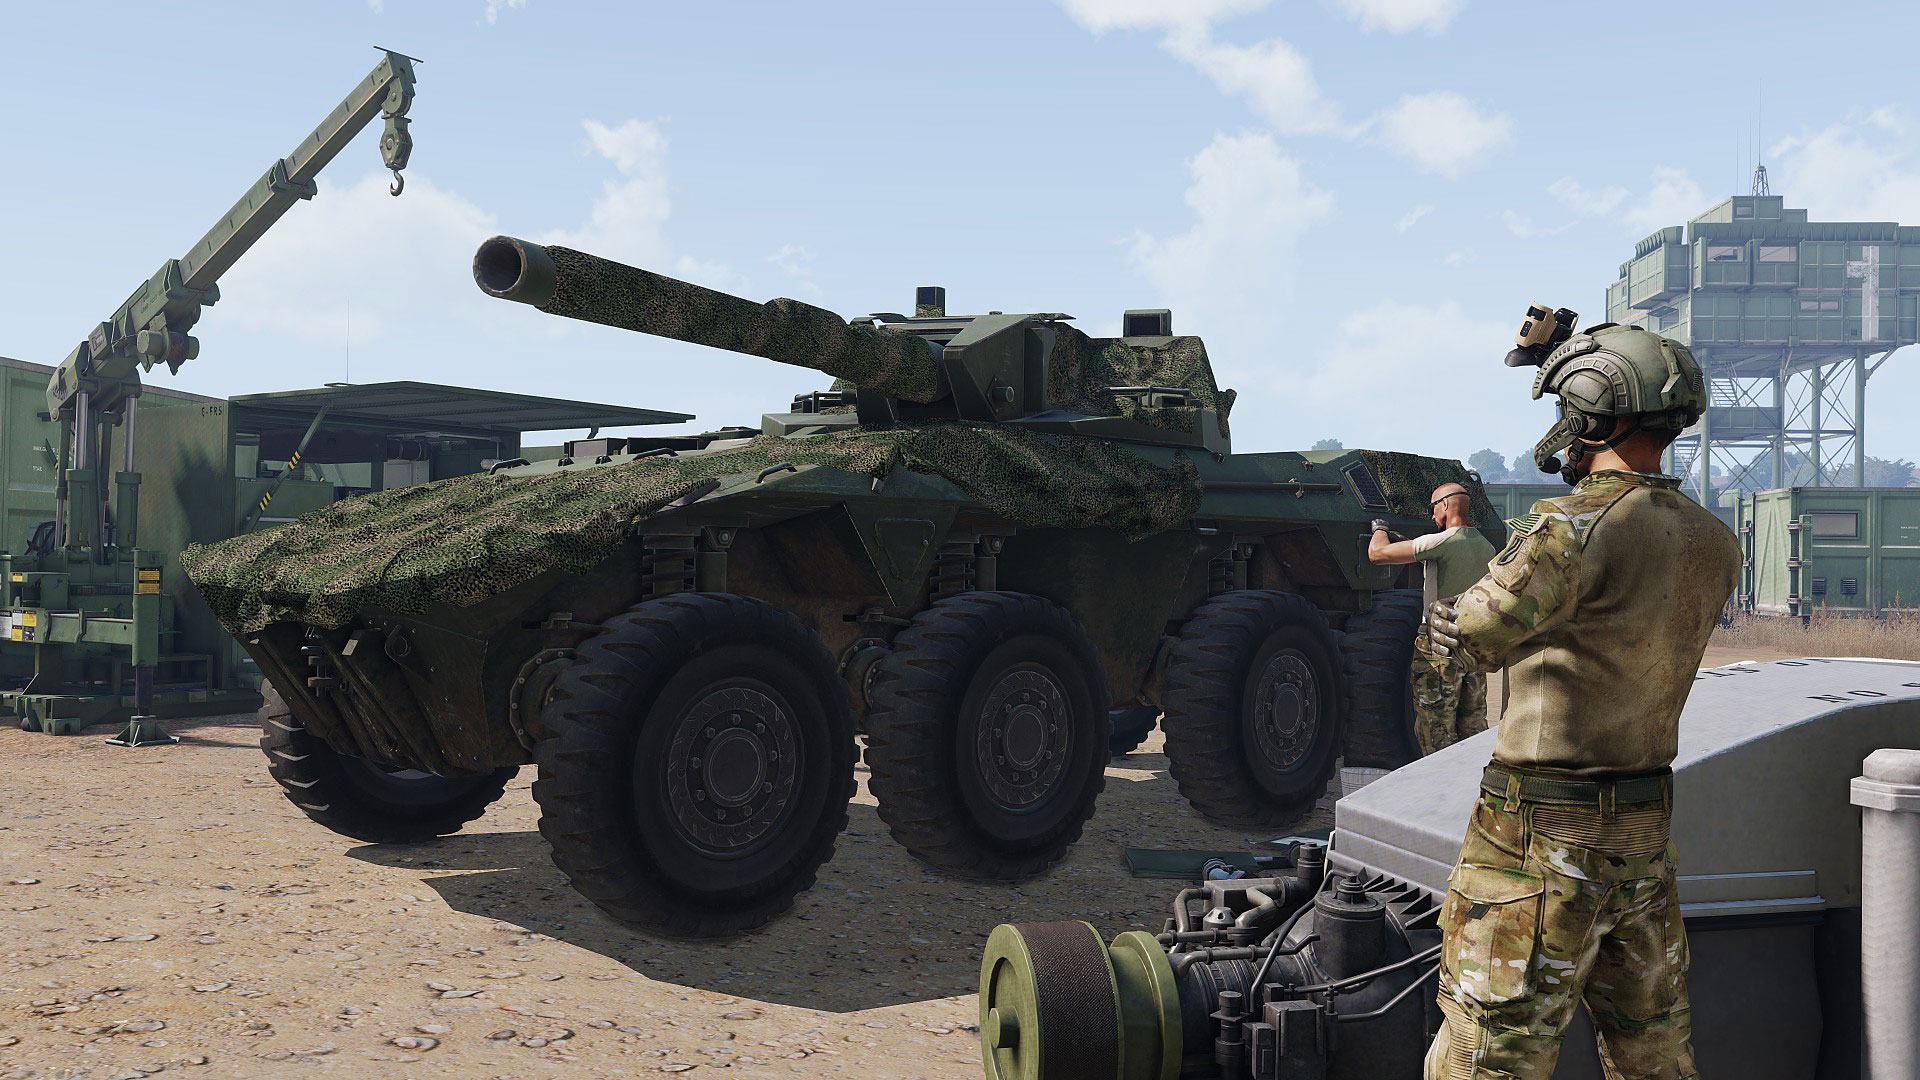 Arma 3 Tanks DLC rolls out on April 11   Blog   Bohemia Interactive